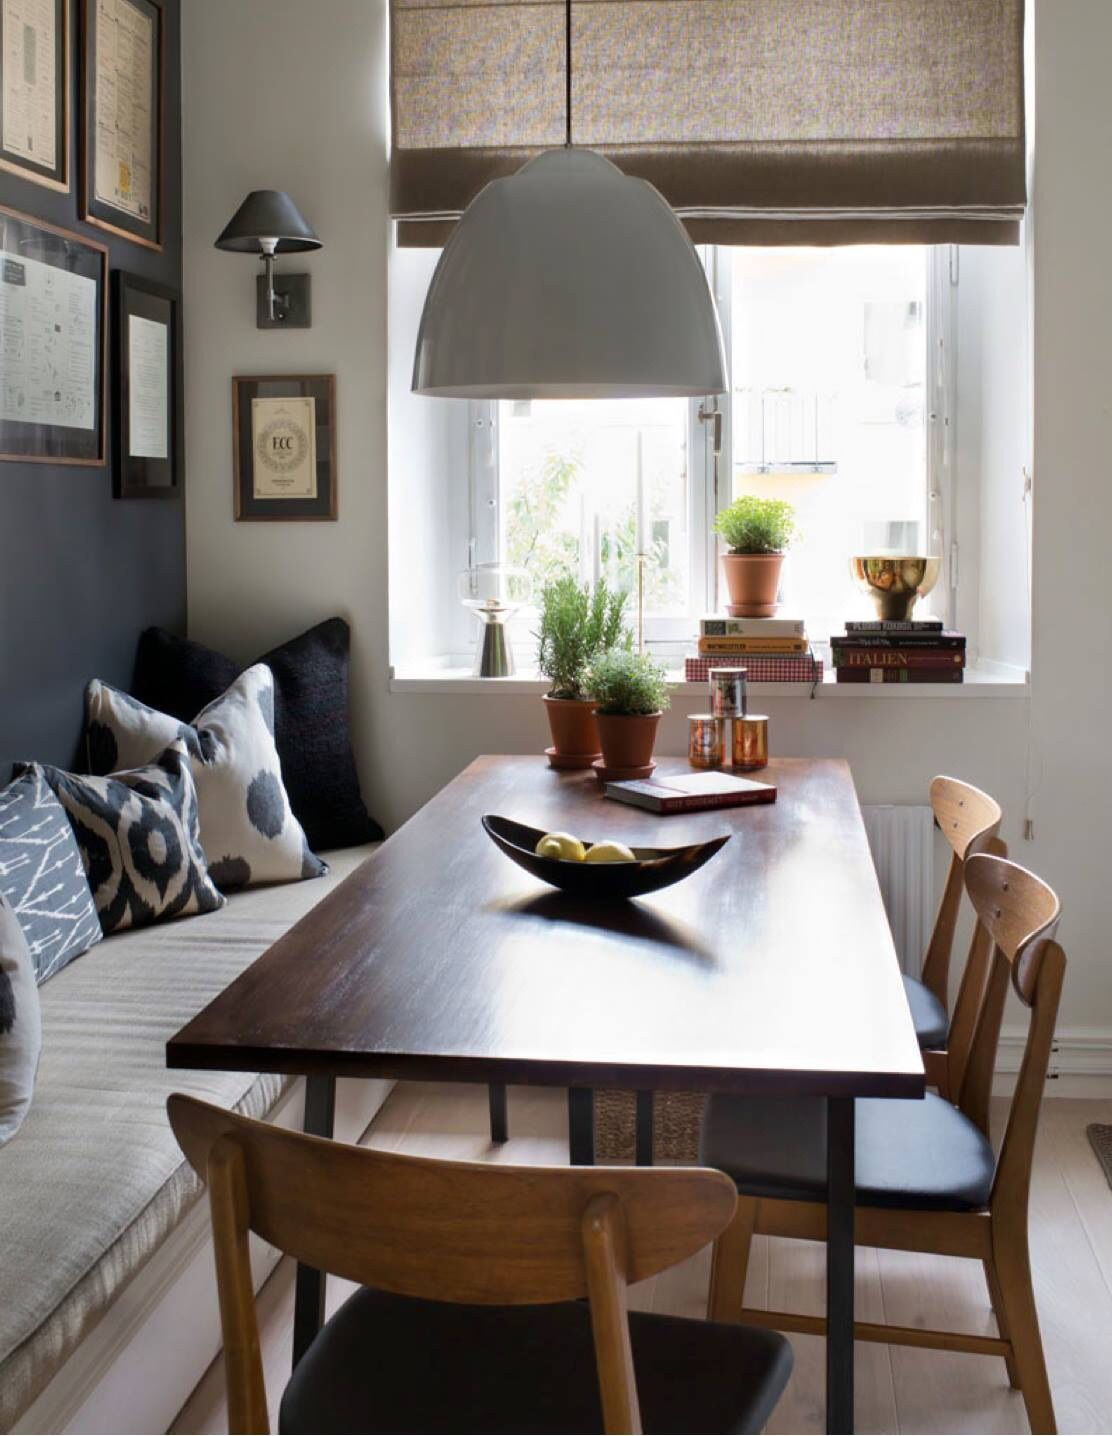 Matplats | Keuken | Pinterest | Comedores, Cocinas y Hogar